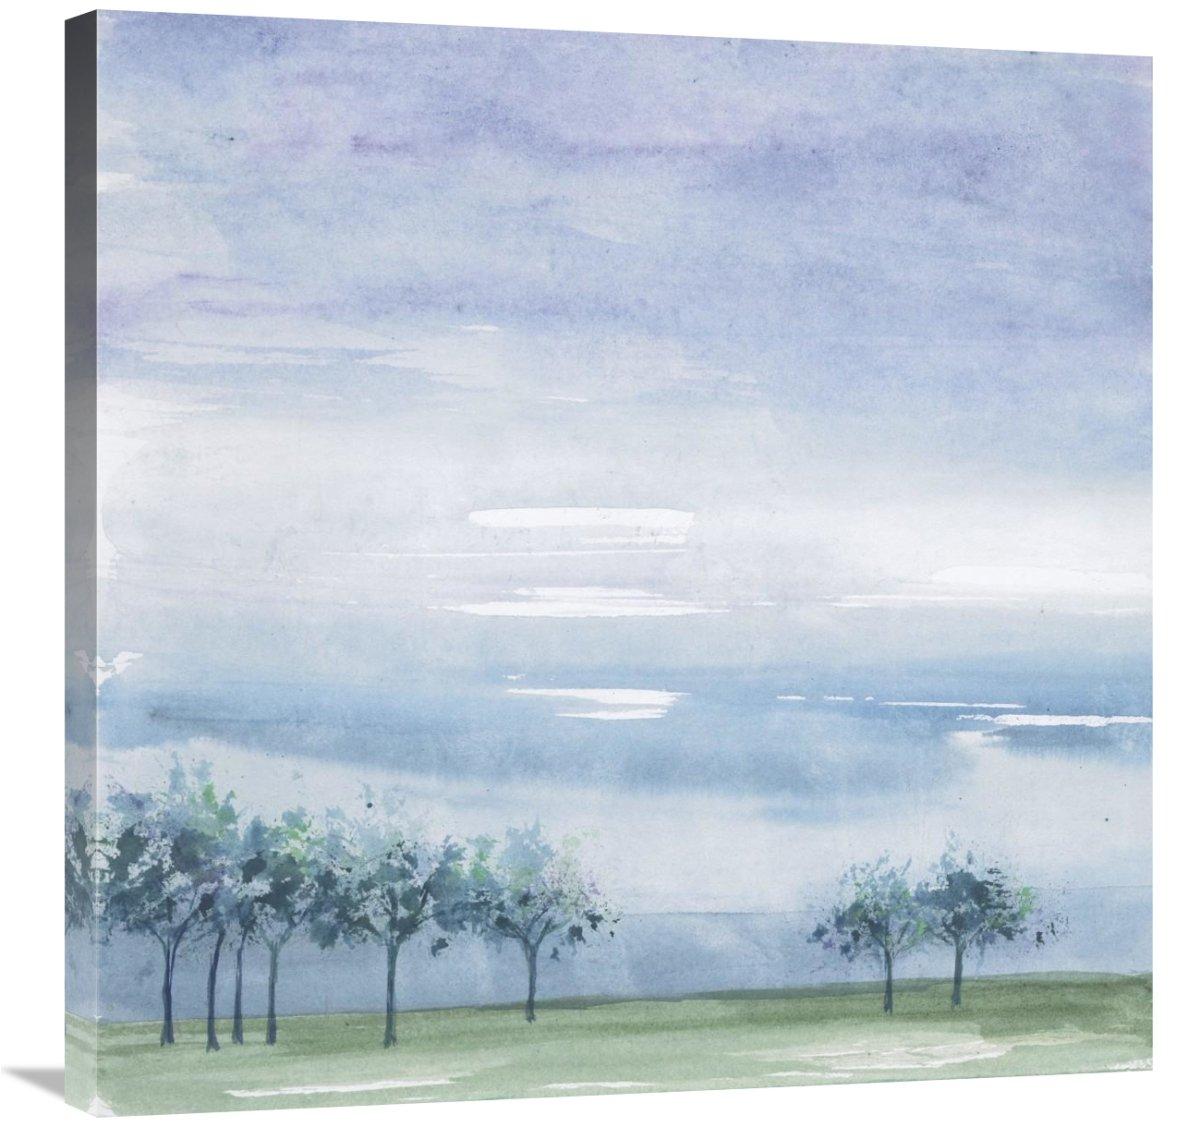 Global Gallery Chris Paschke Rain on The Plain Canvas Artwork 30 x 30